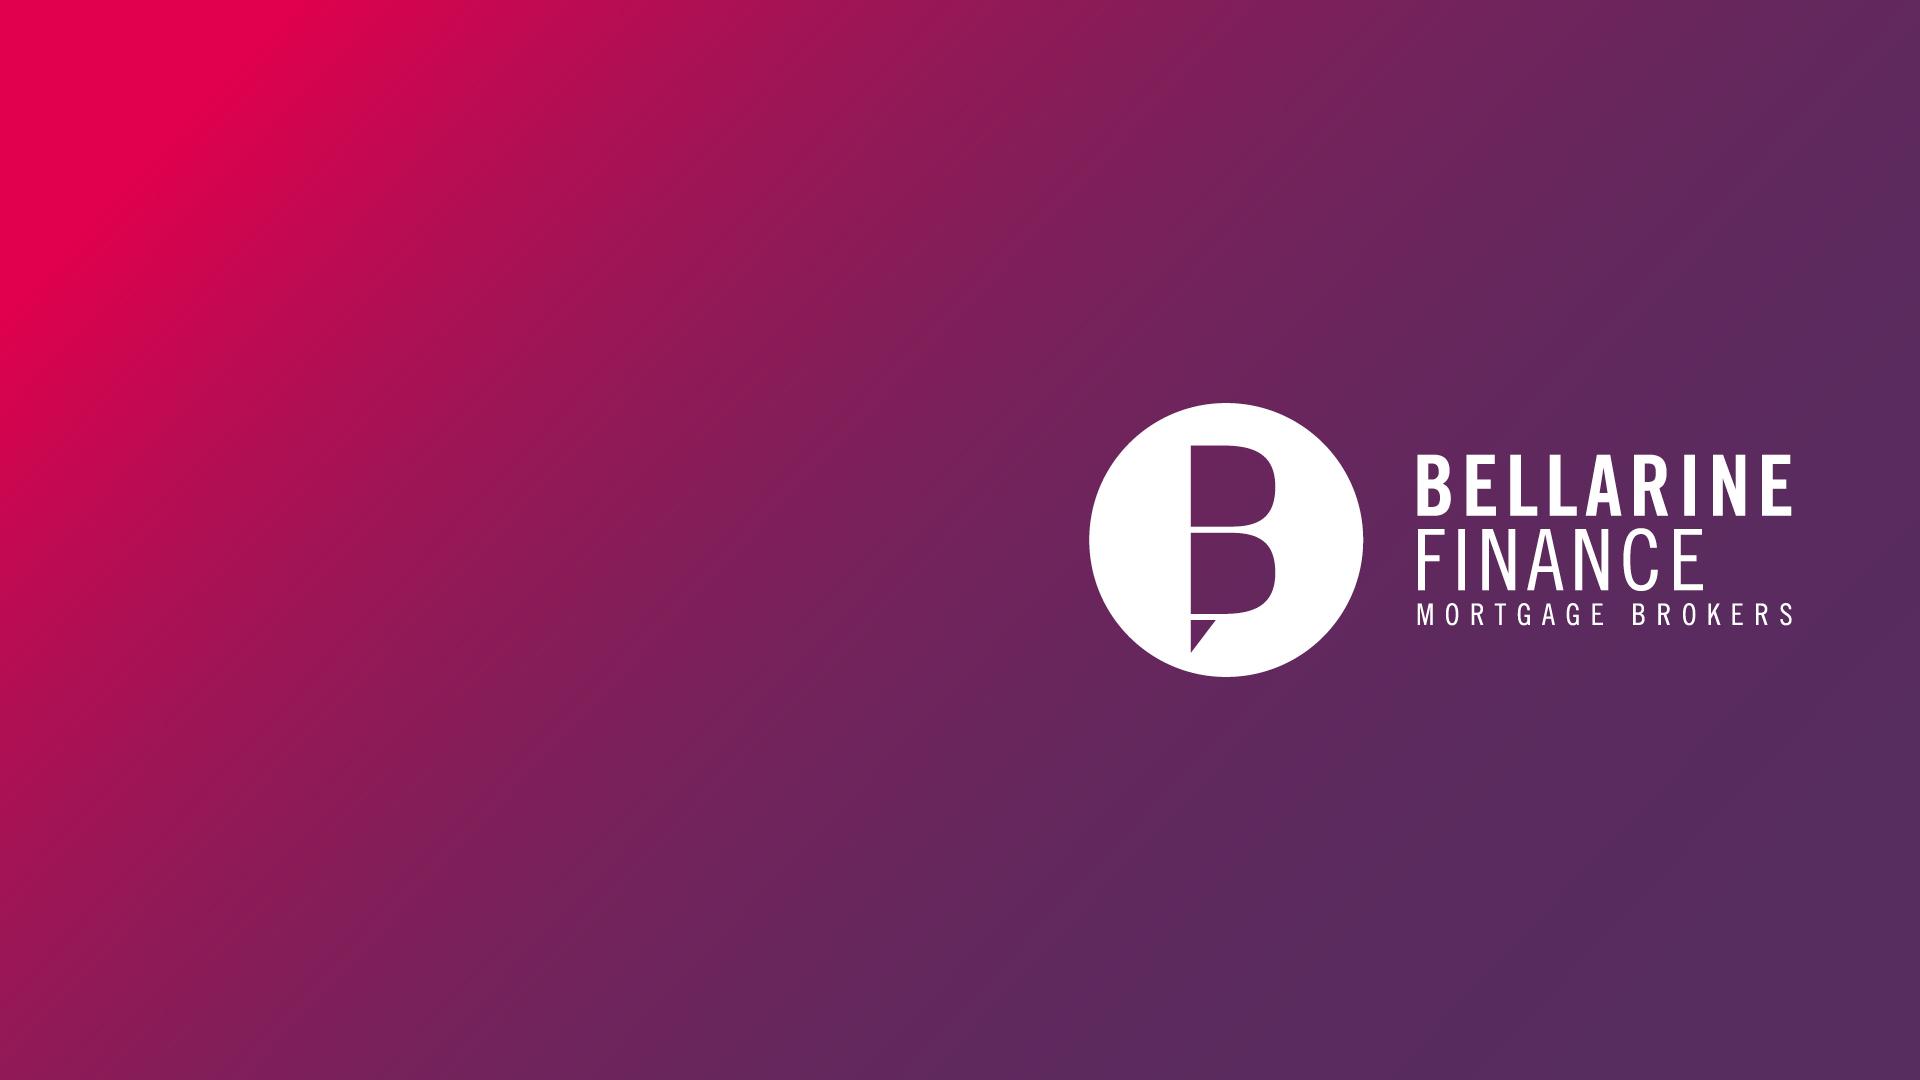 Bellarine Finance, mortgage brokers, geelong, Retailored, creative, design, graphic design